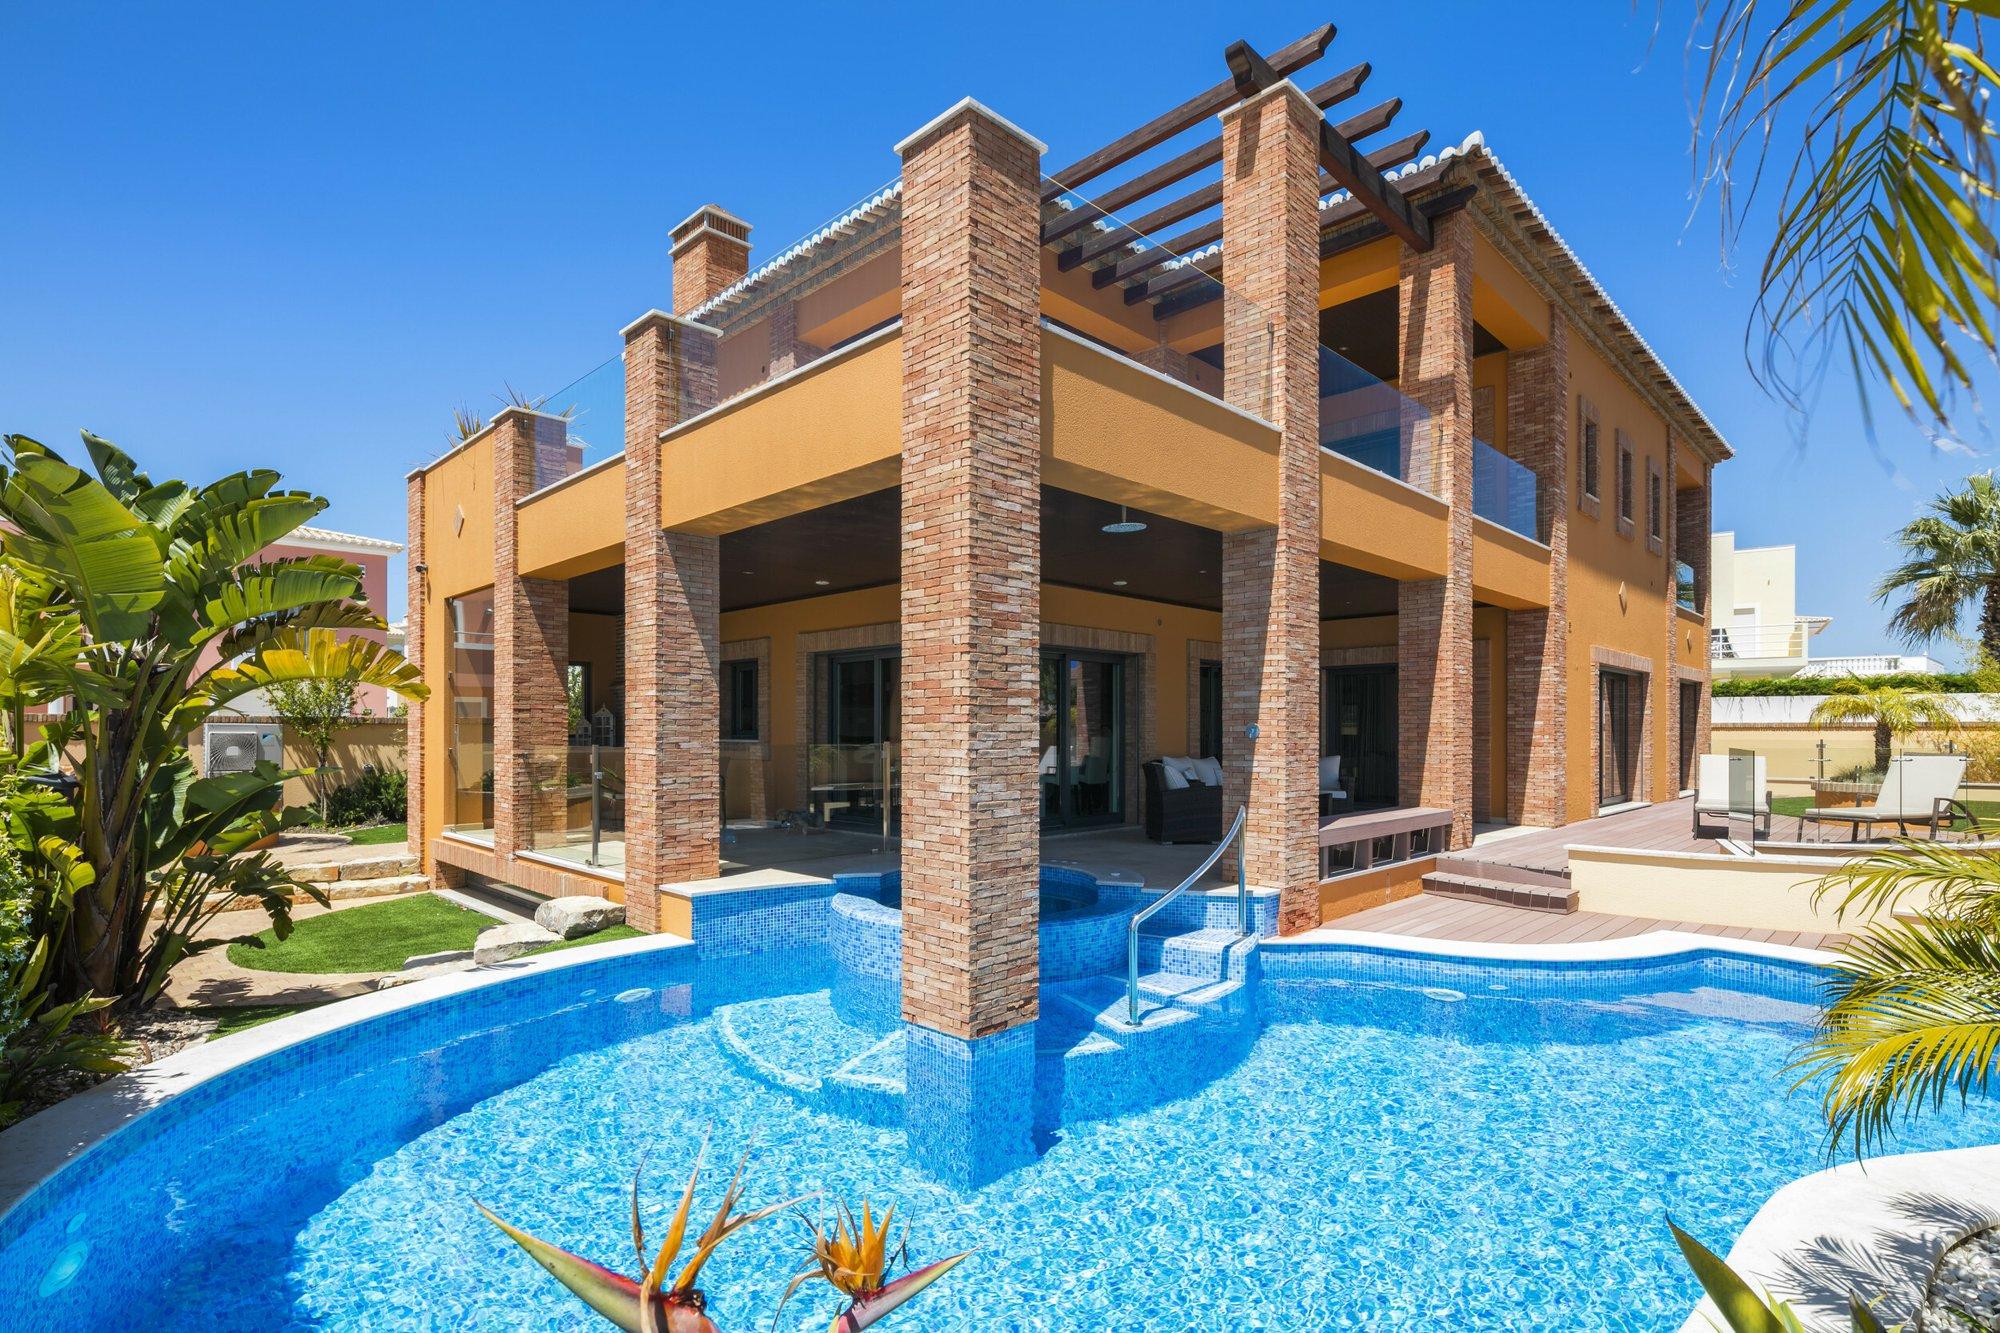 Villa in Lagos, Algarve, Portugal 1 - 11489824